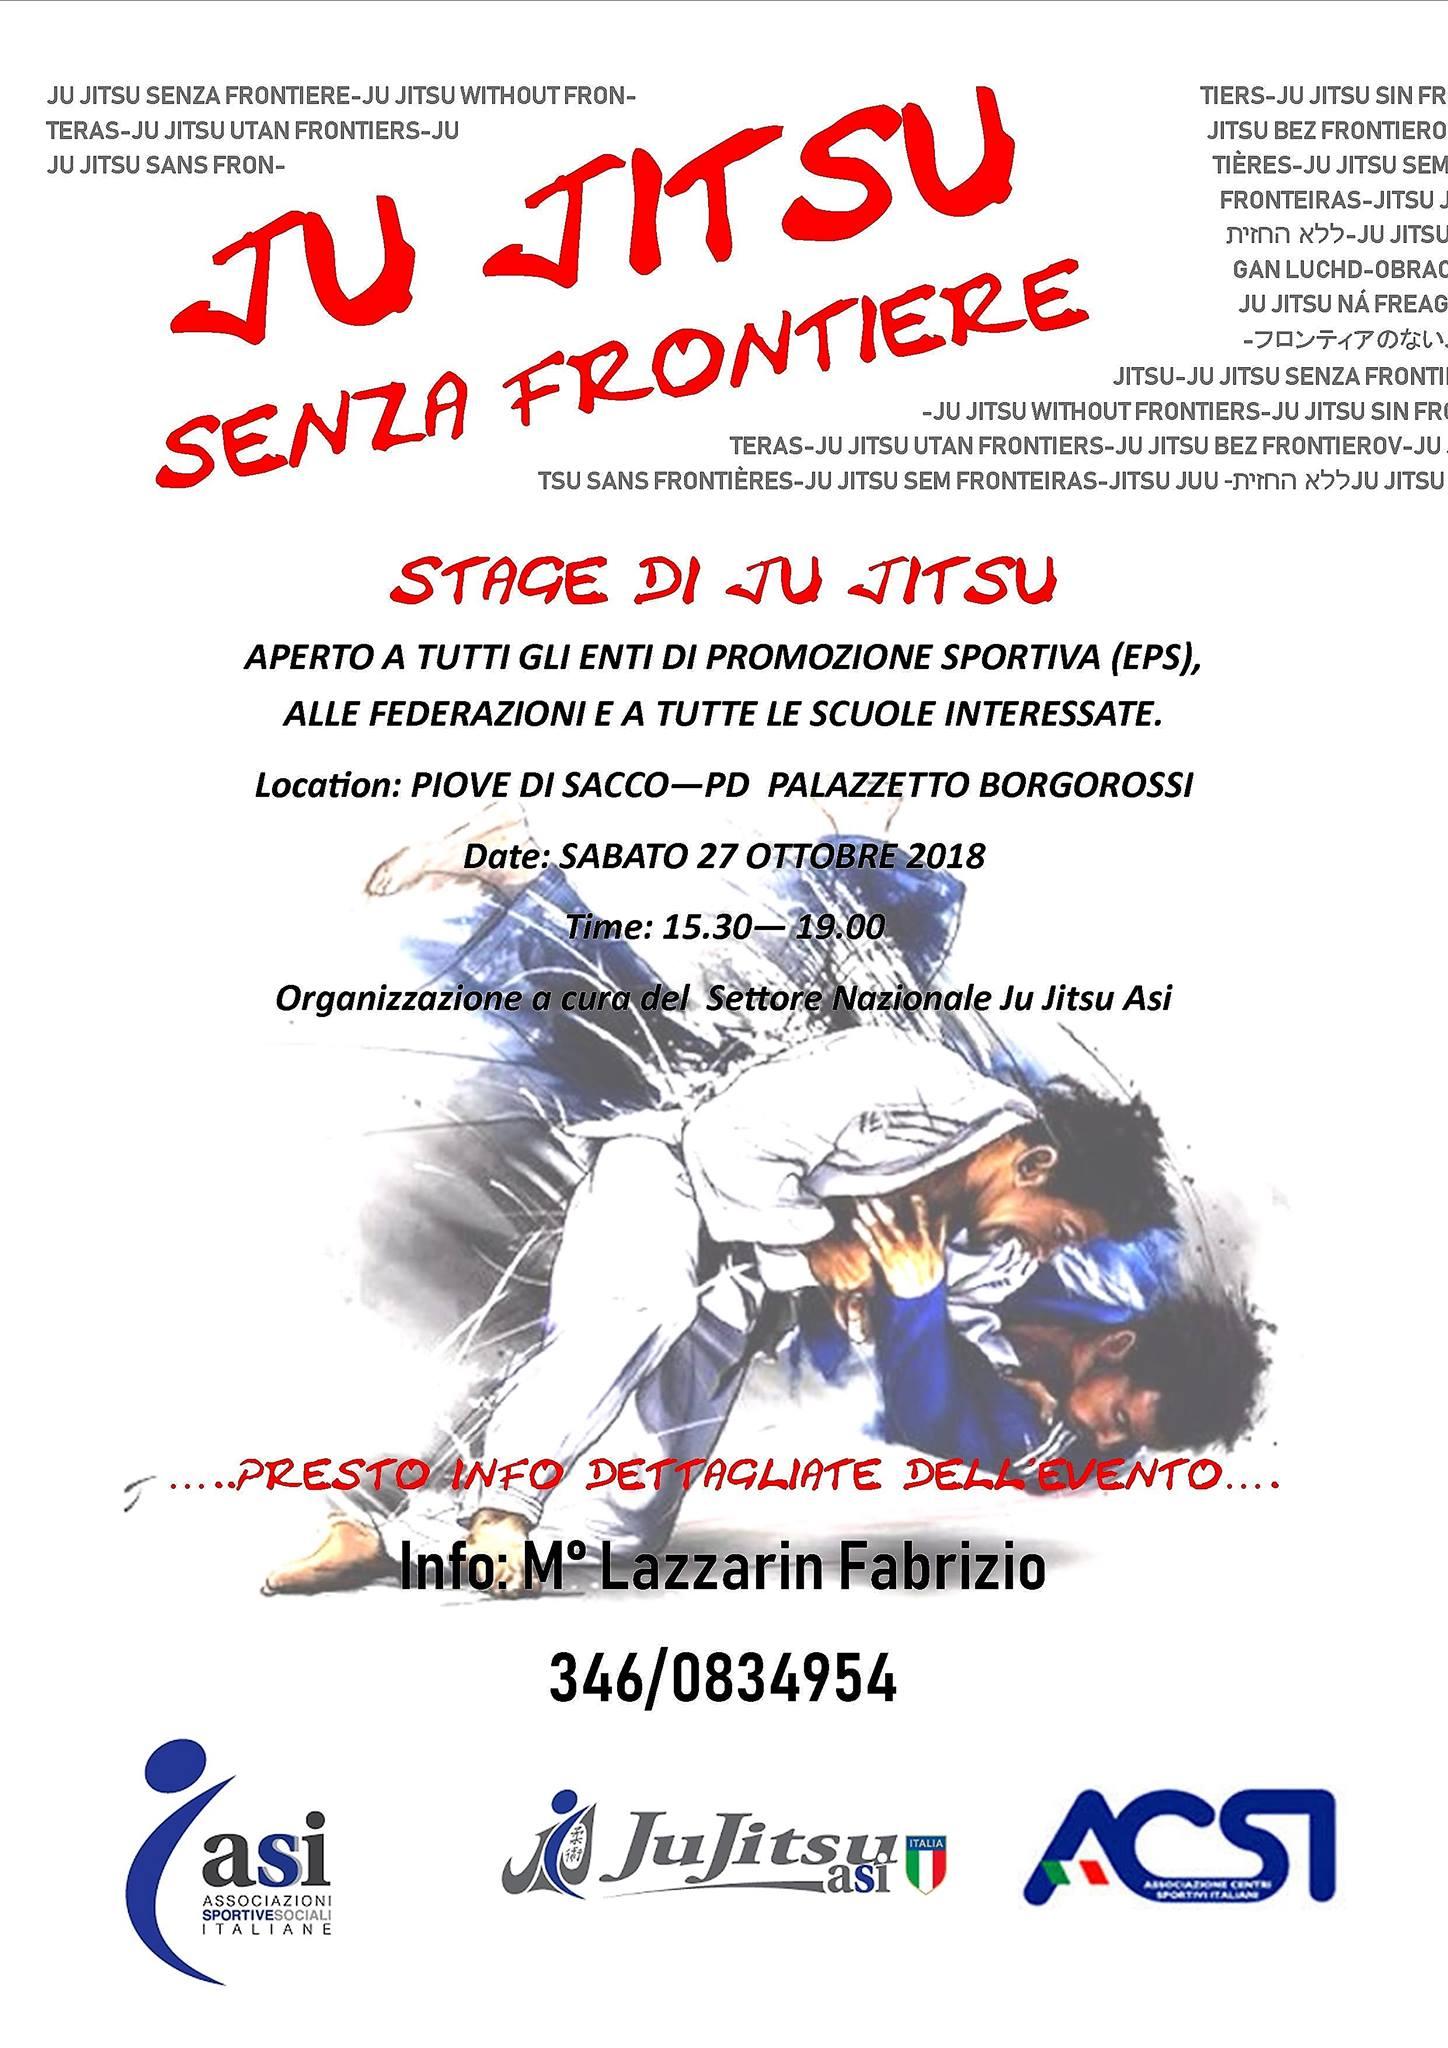 Jujitsu Senza frontiere